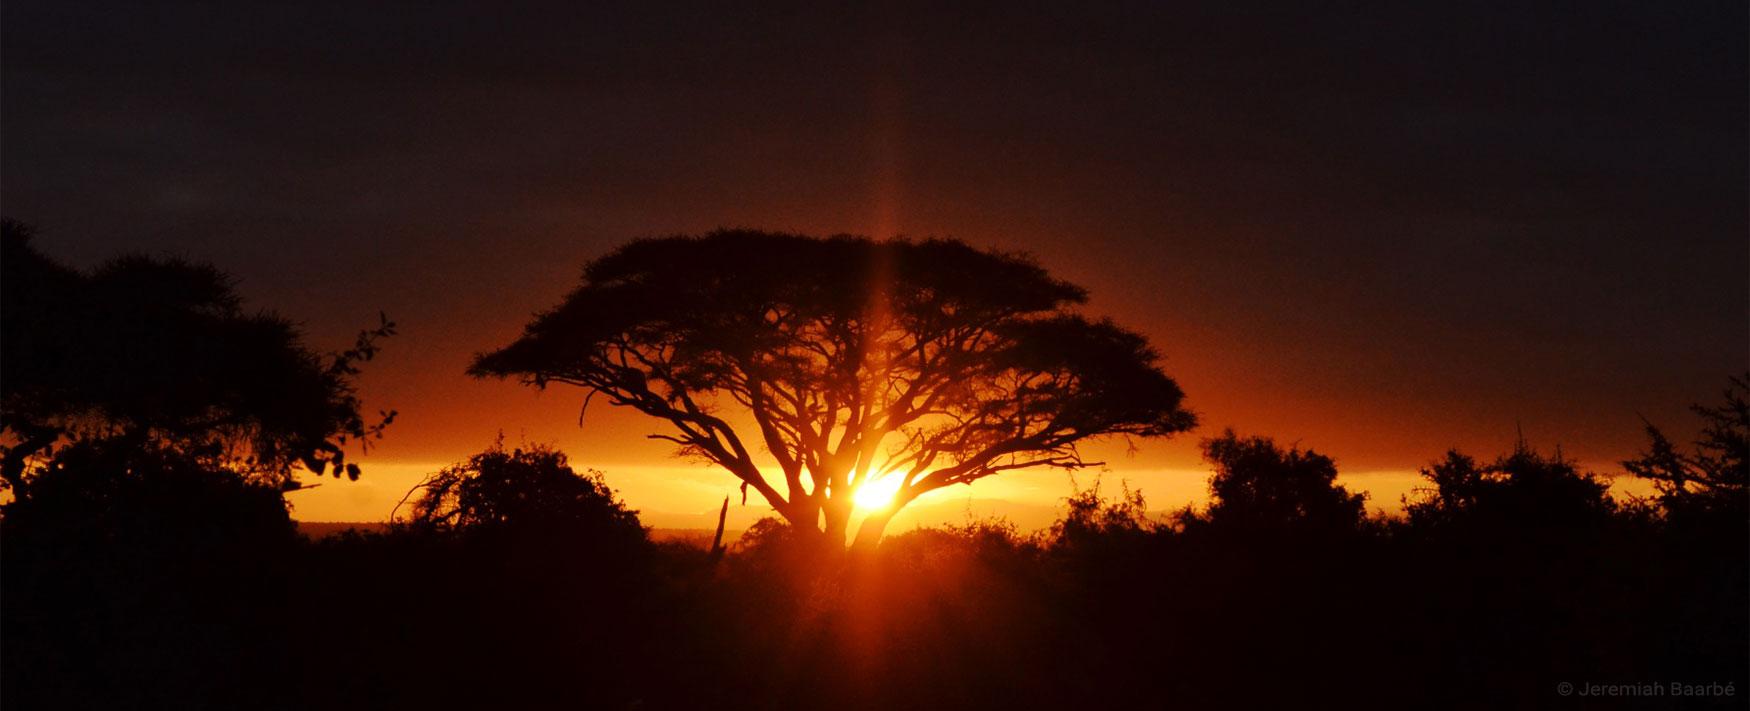 The sun rising above Amboseli, Kenya